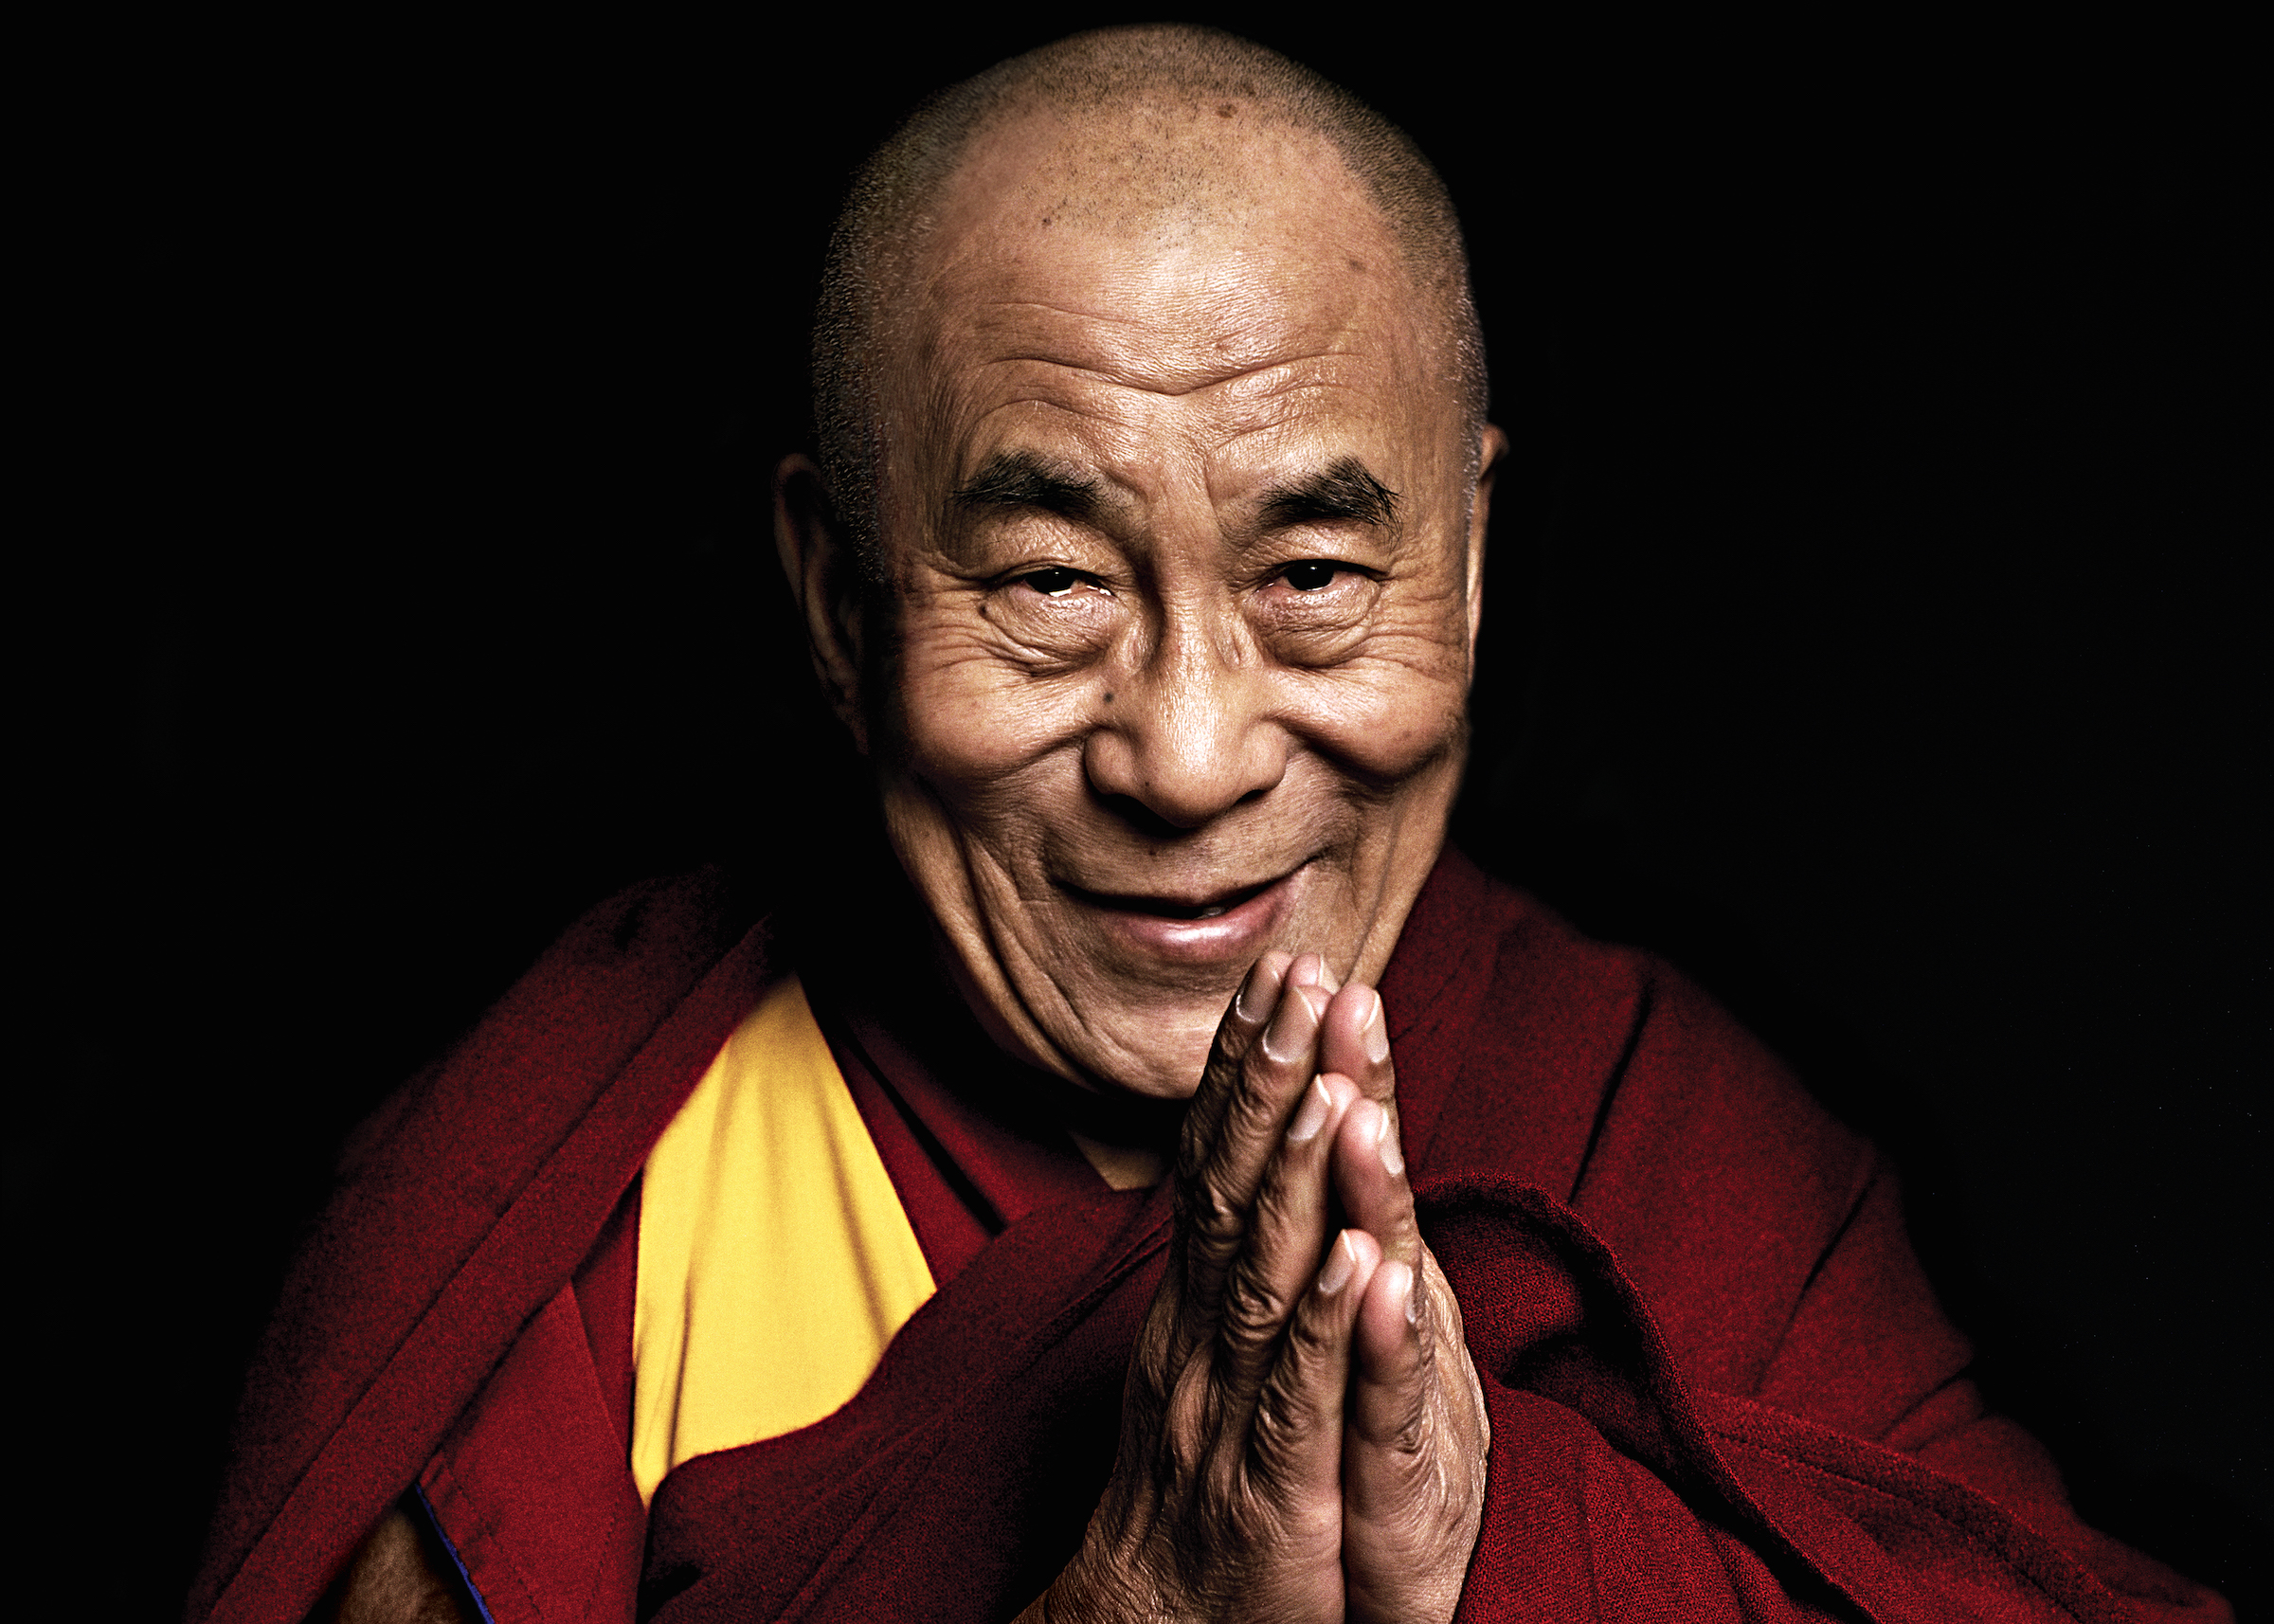 happiness-dalai-lama-bhutan.ngsversion.1470164777953.jpg